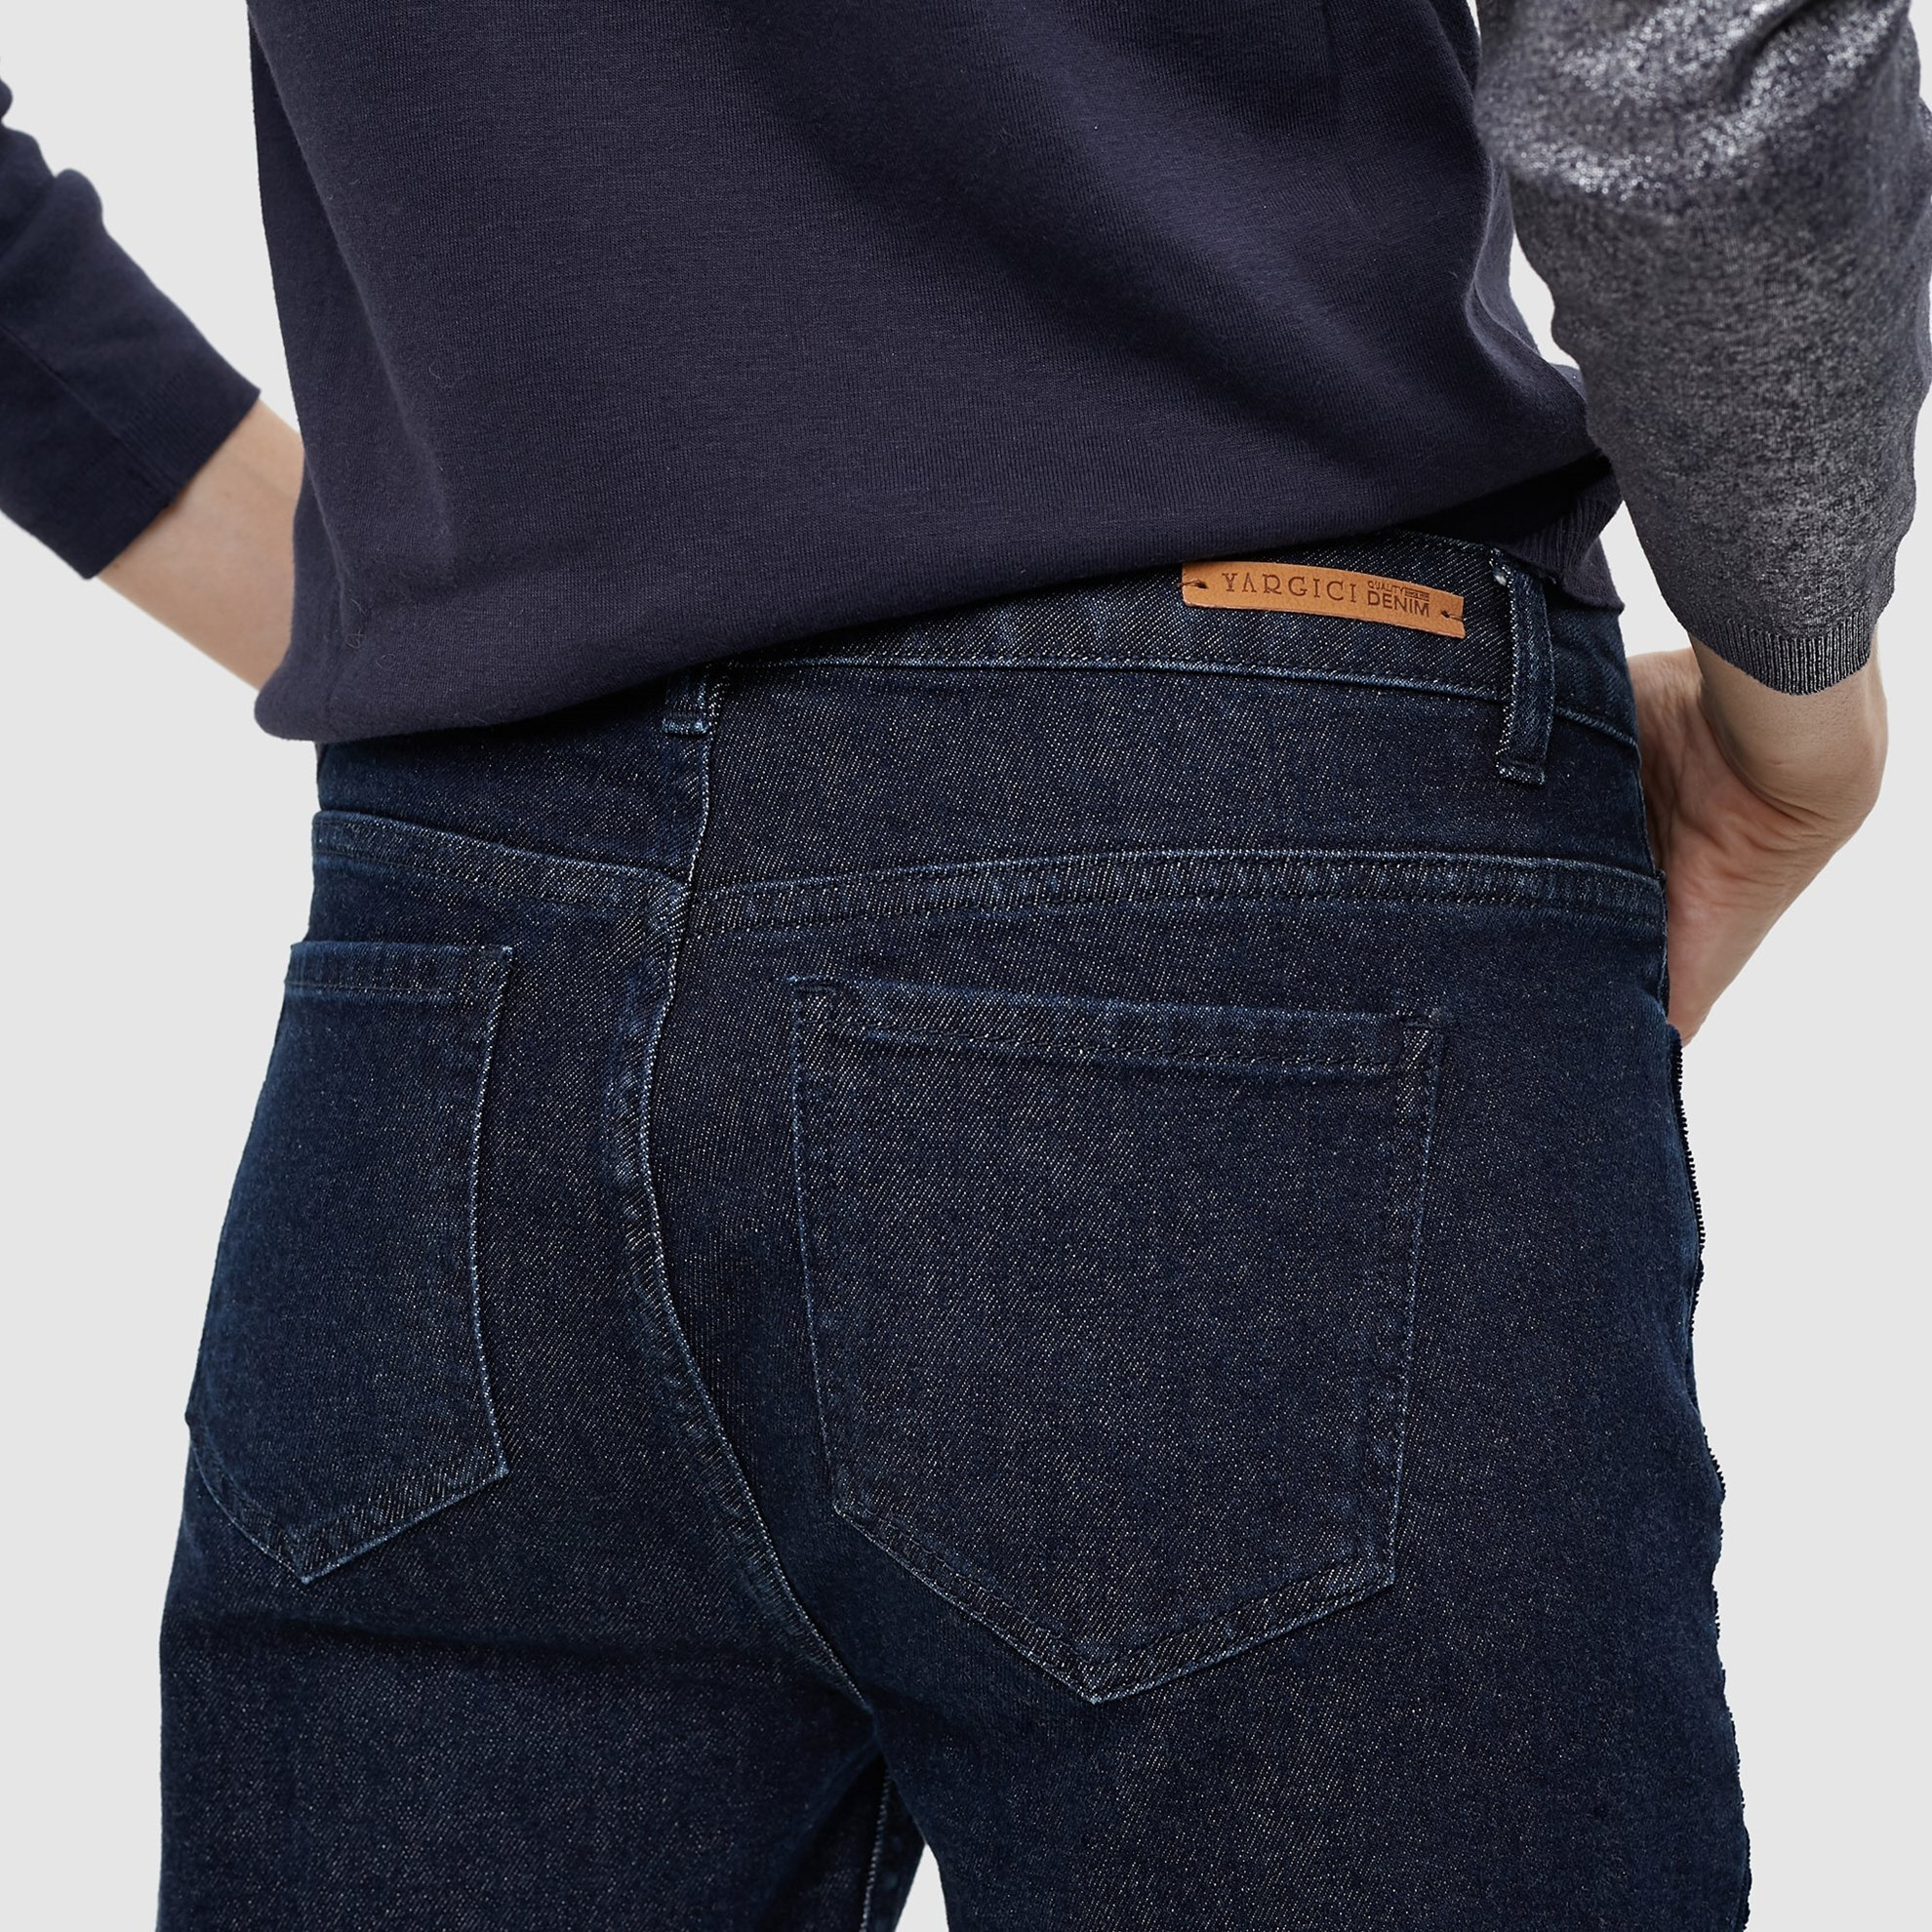 Contrast Detailed Slim Fit  Denim Pants